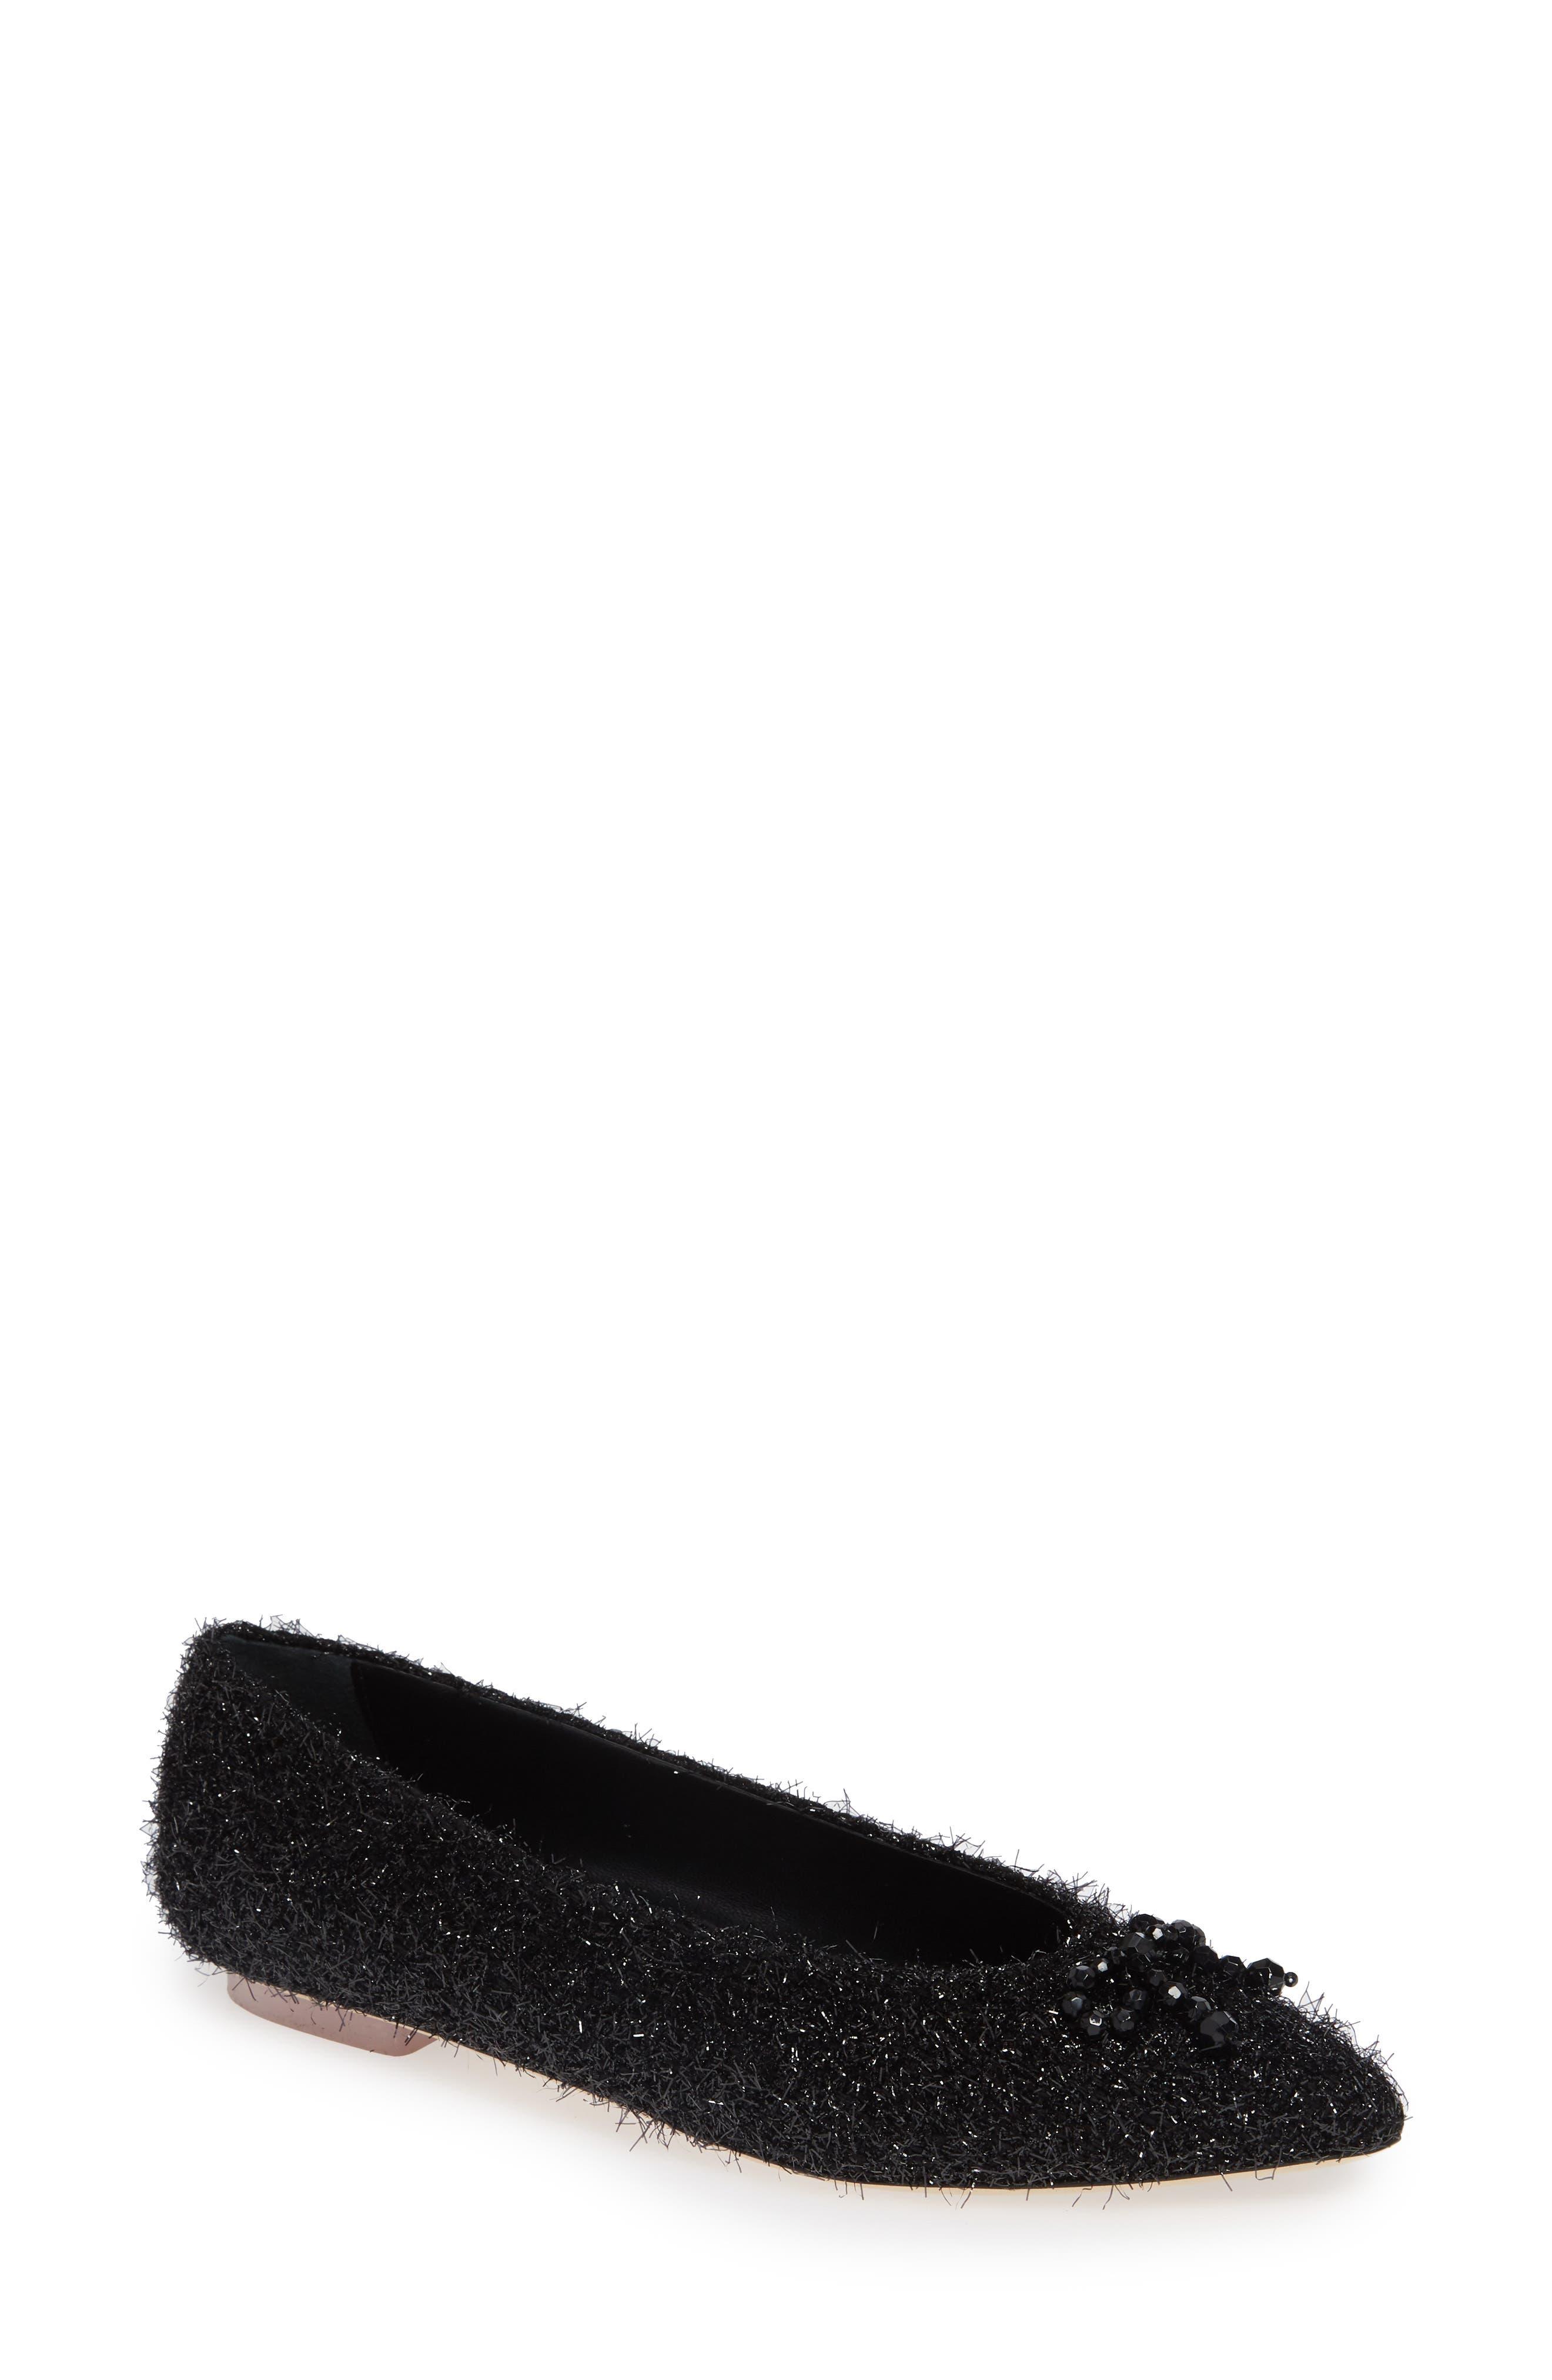 Simone Rocha Beaded Tinsel Flat, Black